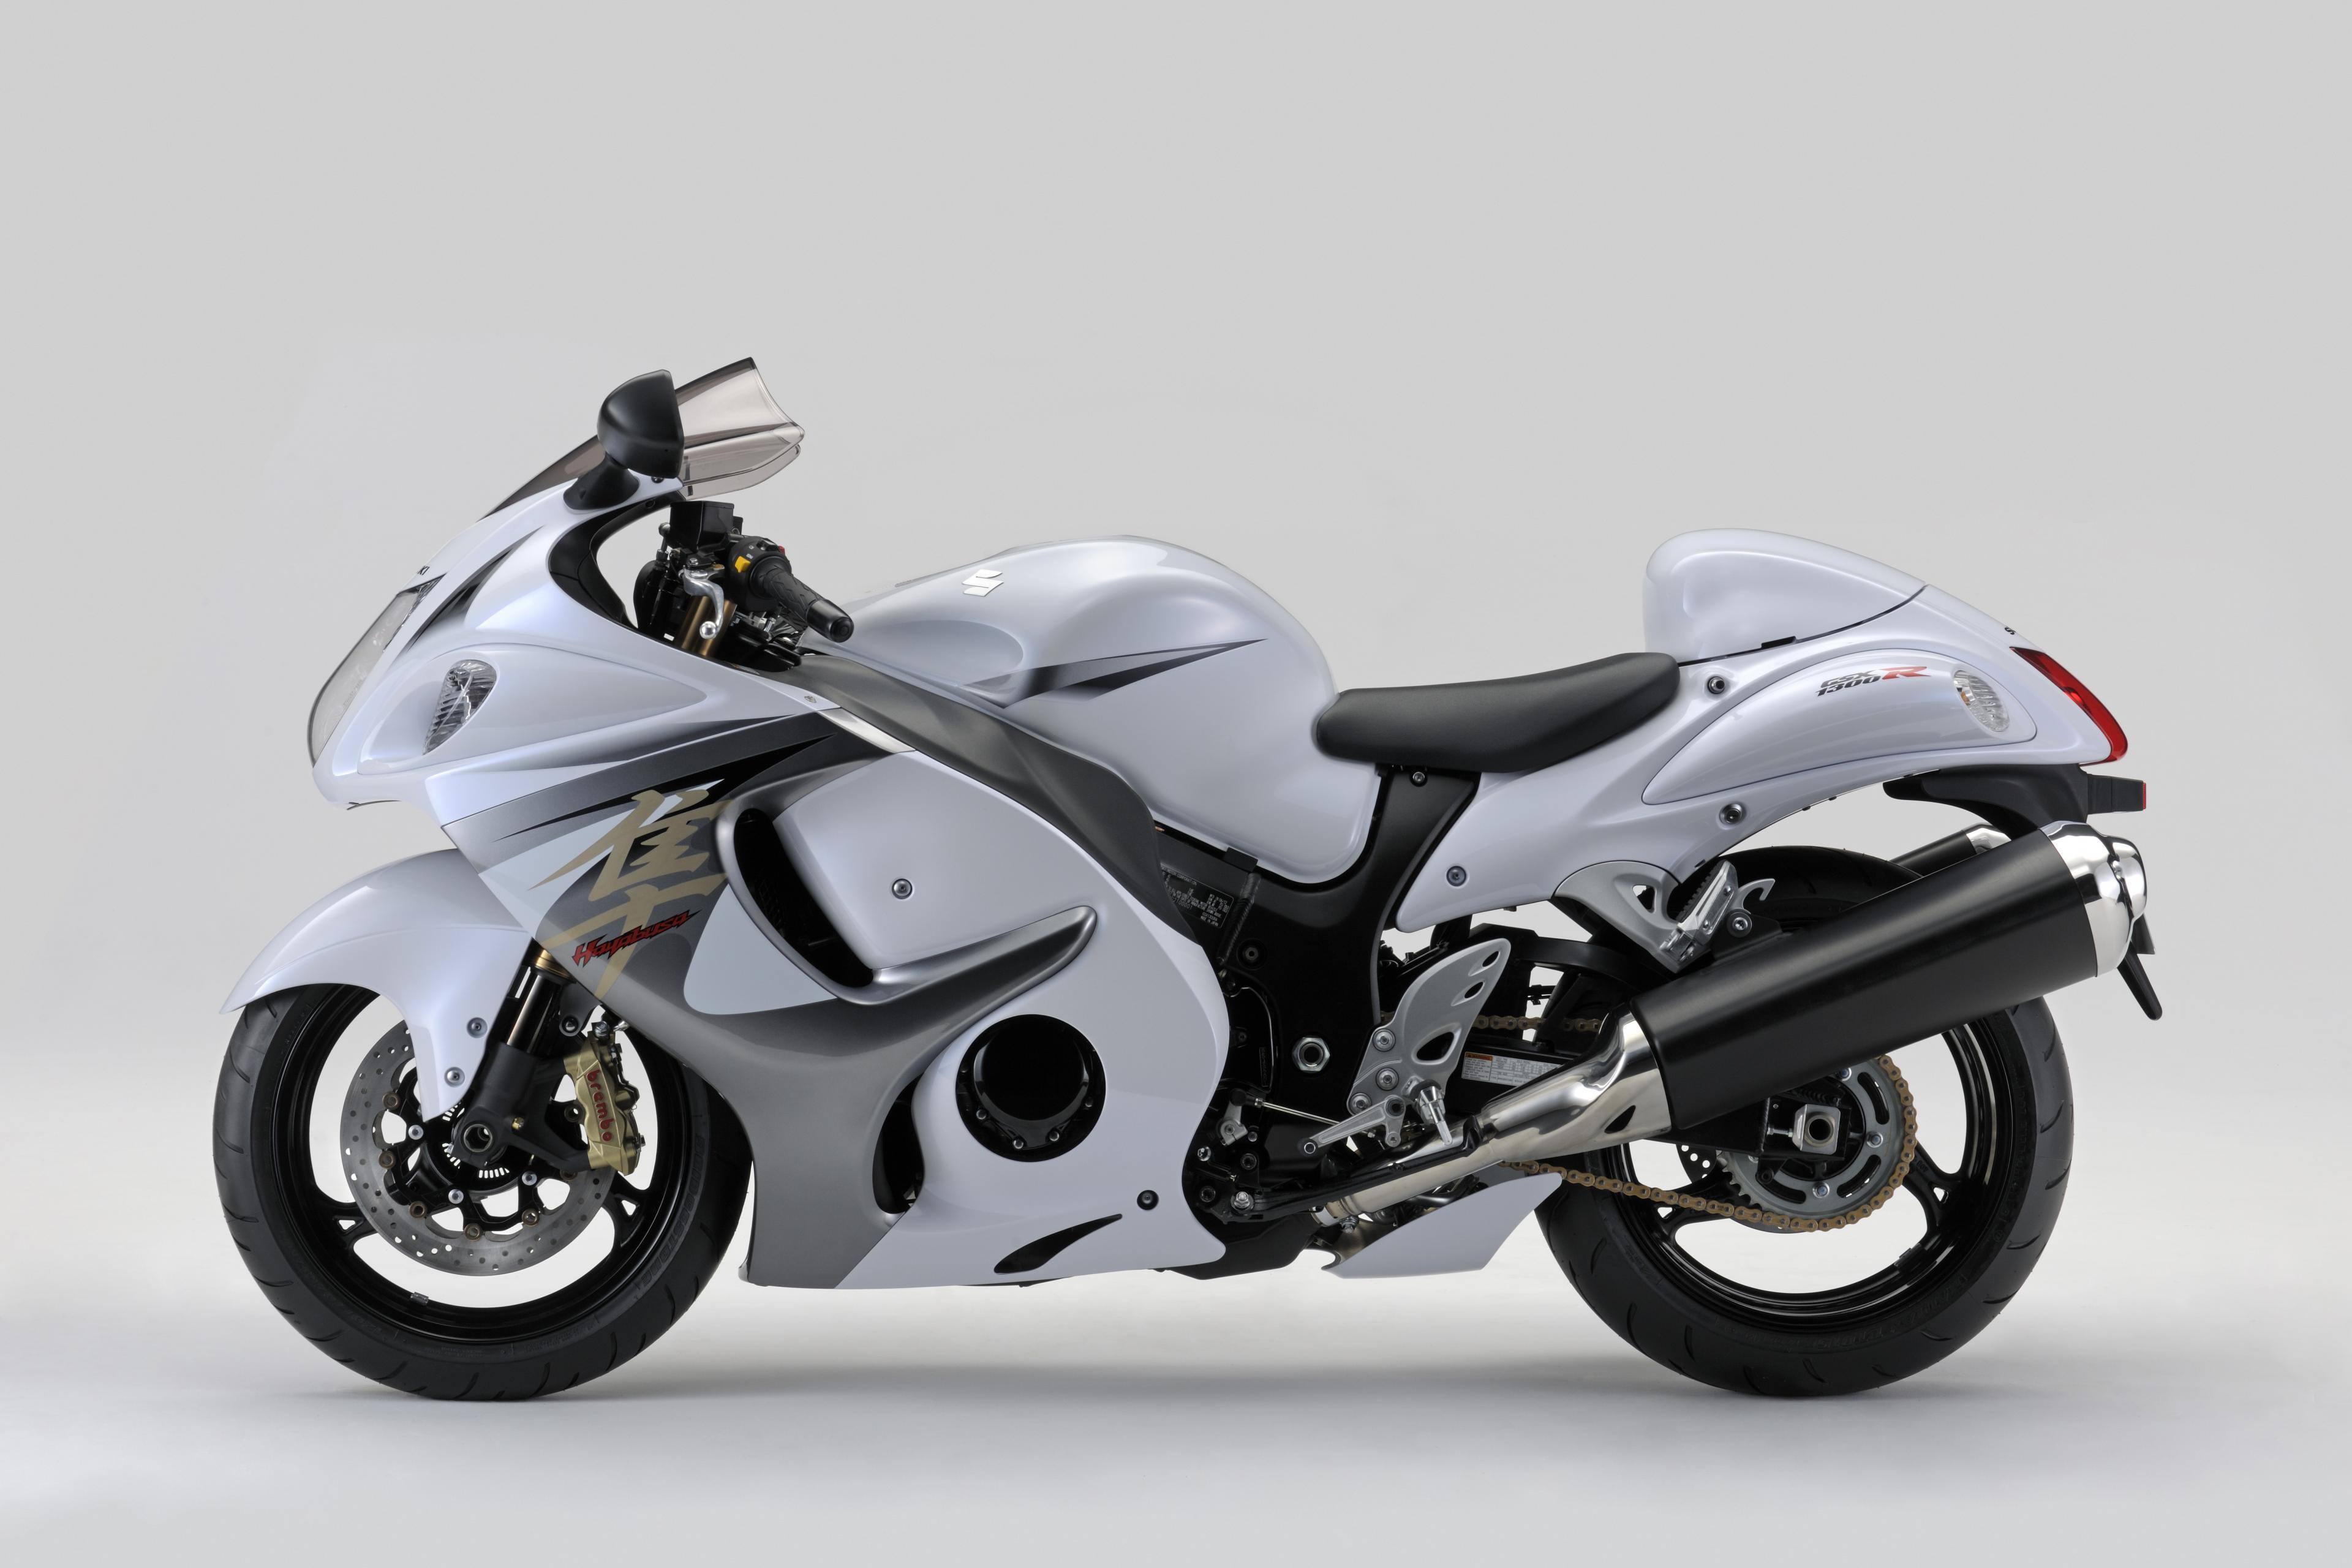 Suzuki Hayabusa • For Sale • Price Guide • The Bike Market